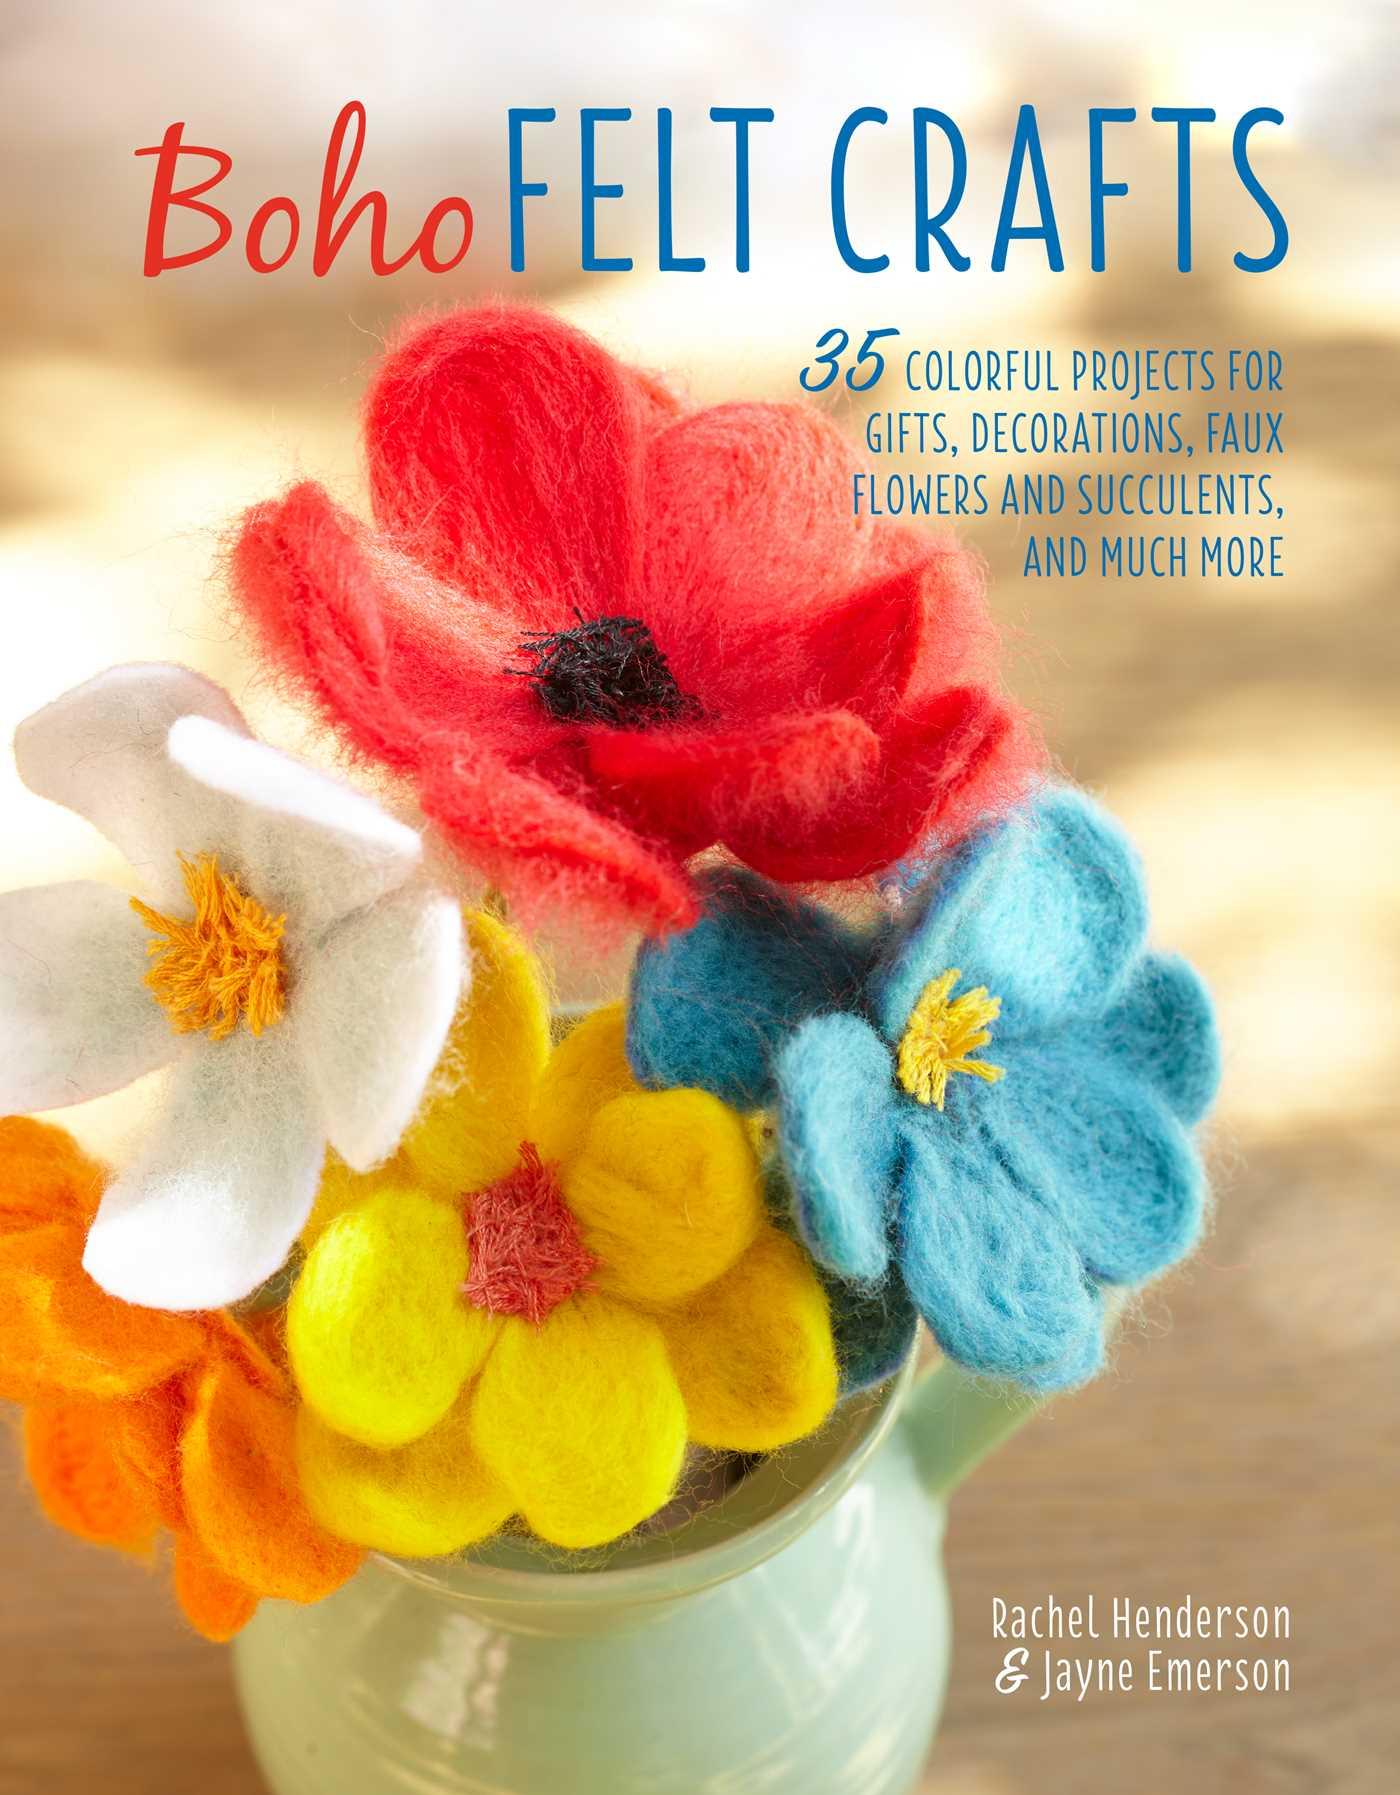 Boho felt crafts 9781782495550 hr